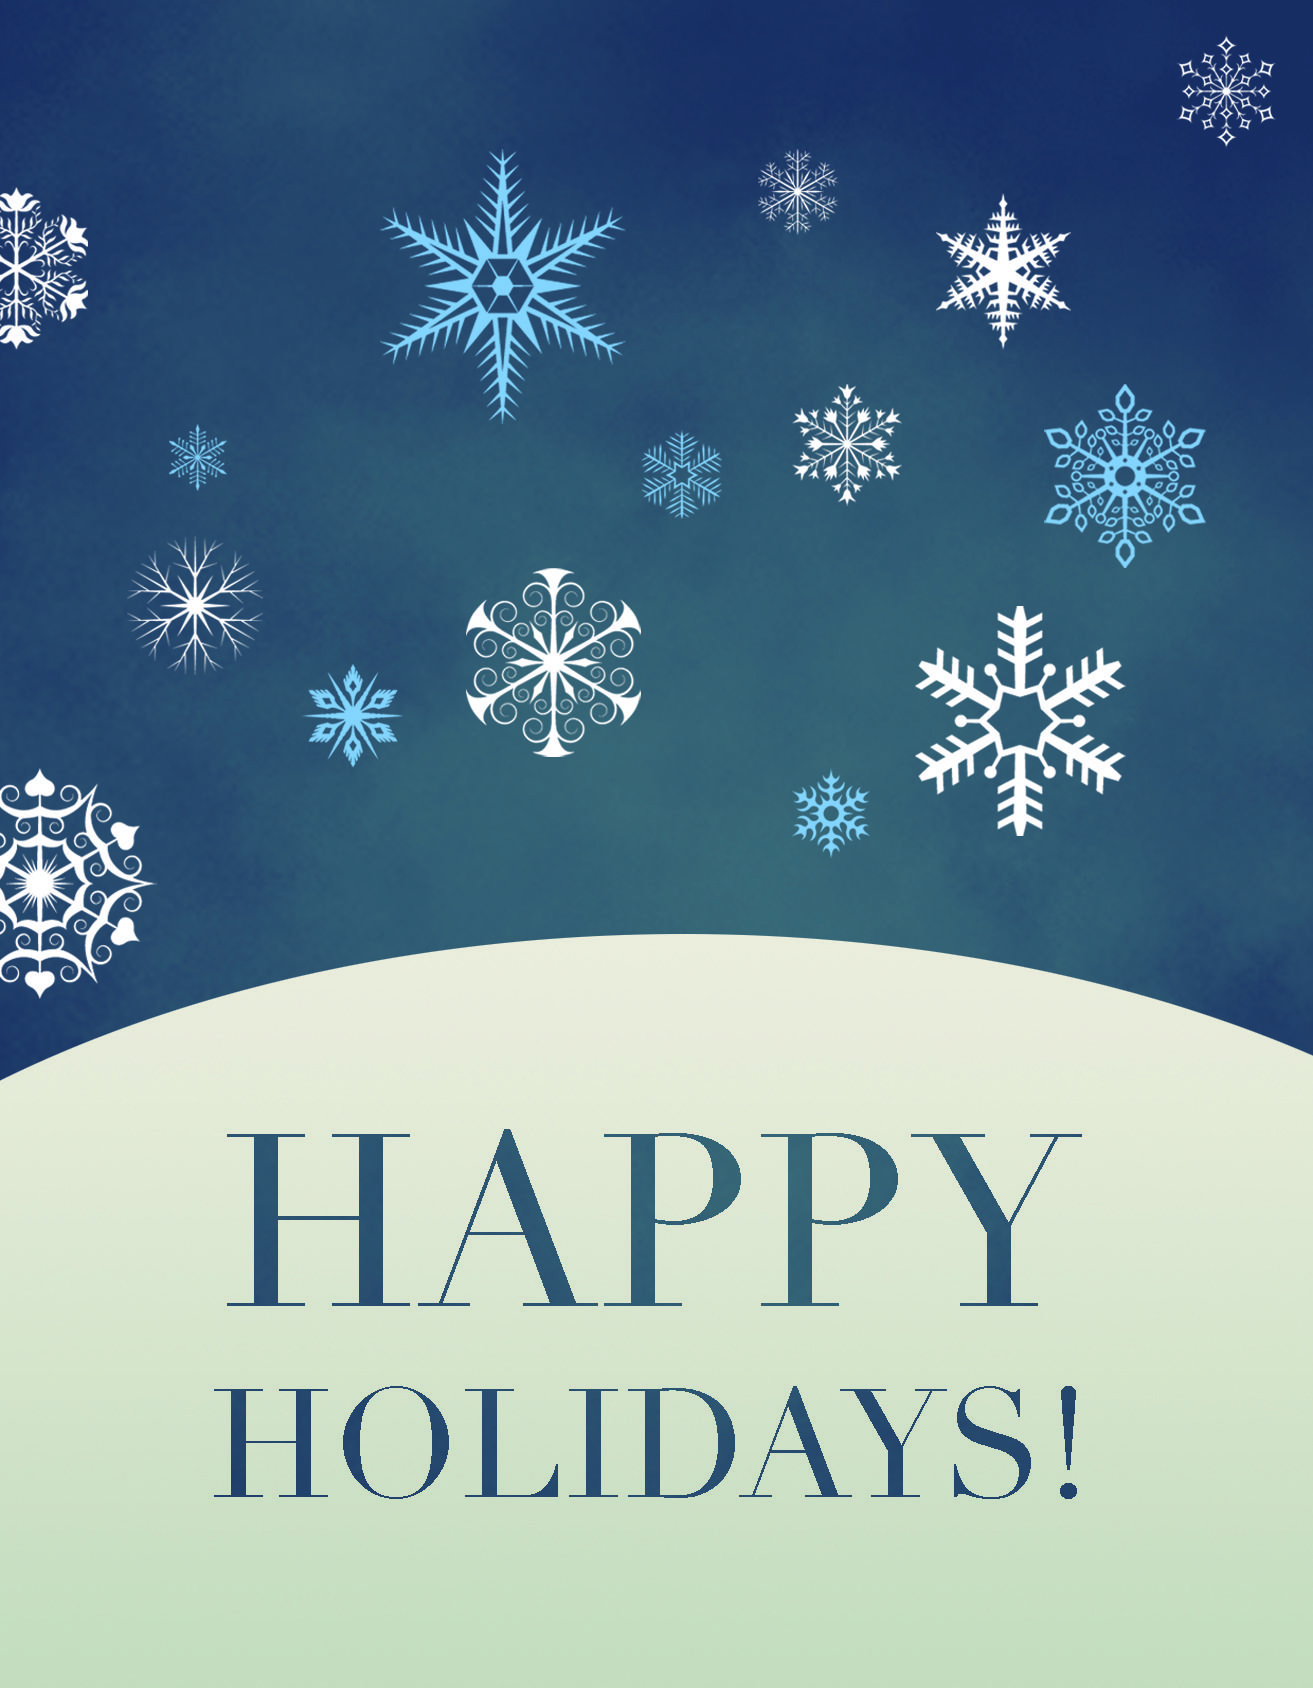 Happy Holiday Card Design By Marni G Designs Marnigdesigns